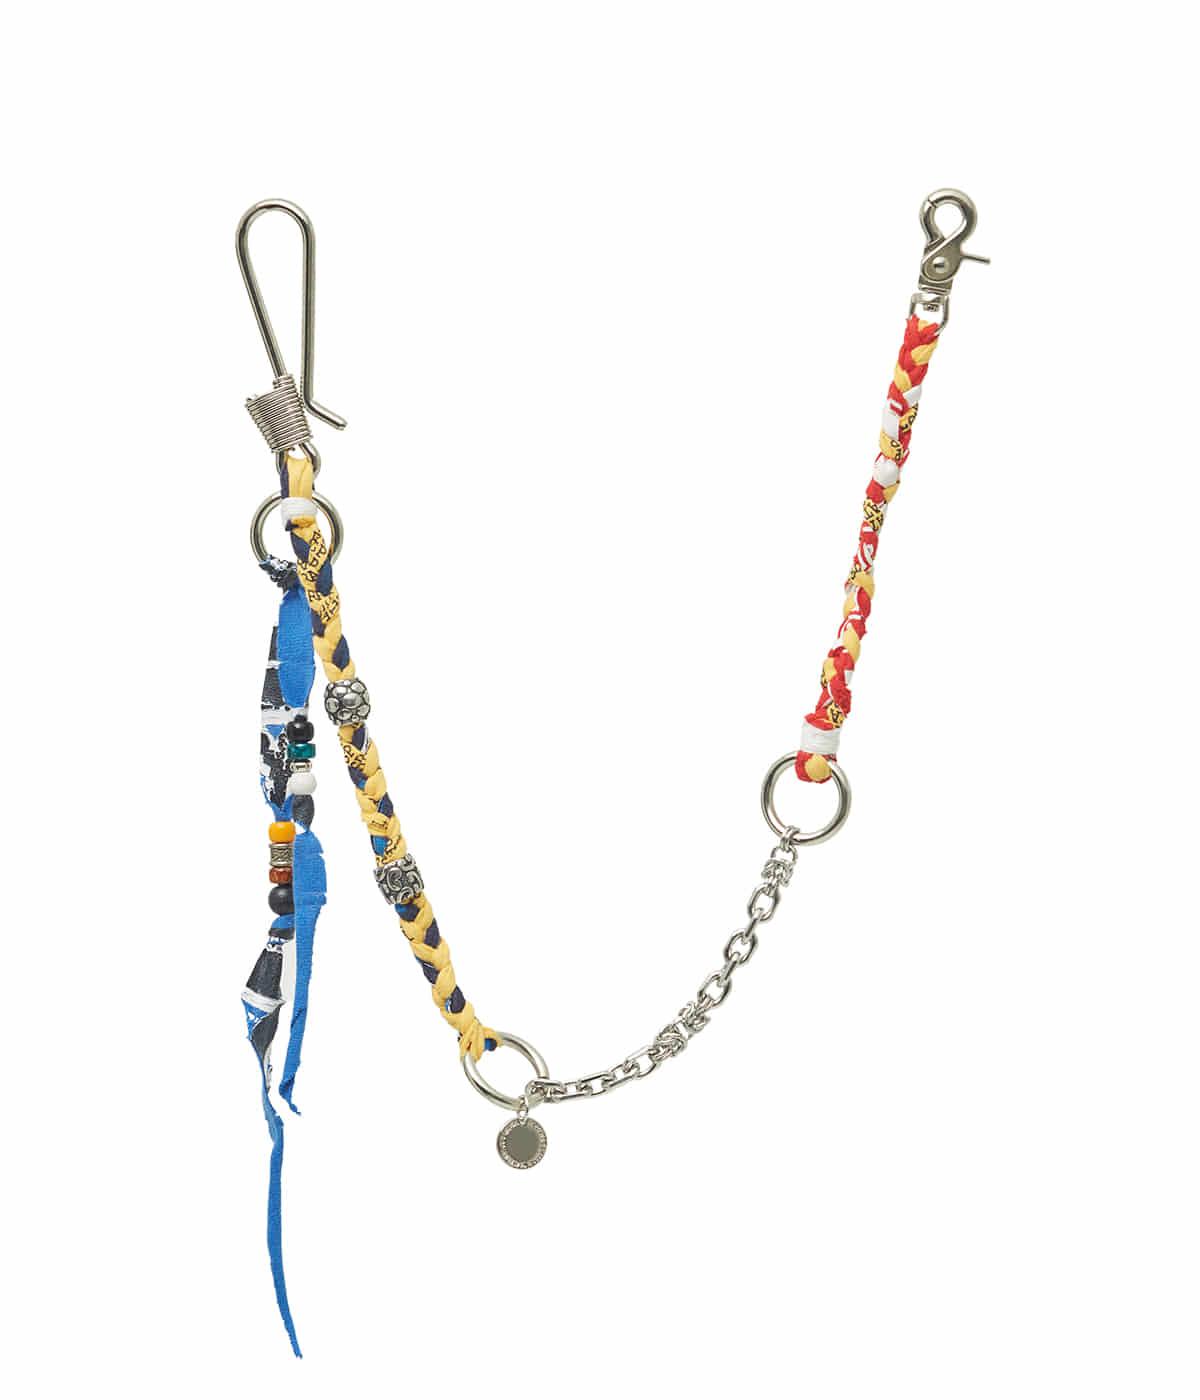 Double Fabric Key-chain (Multi)